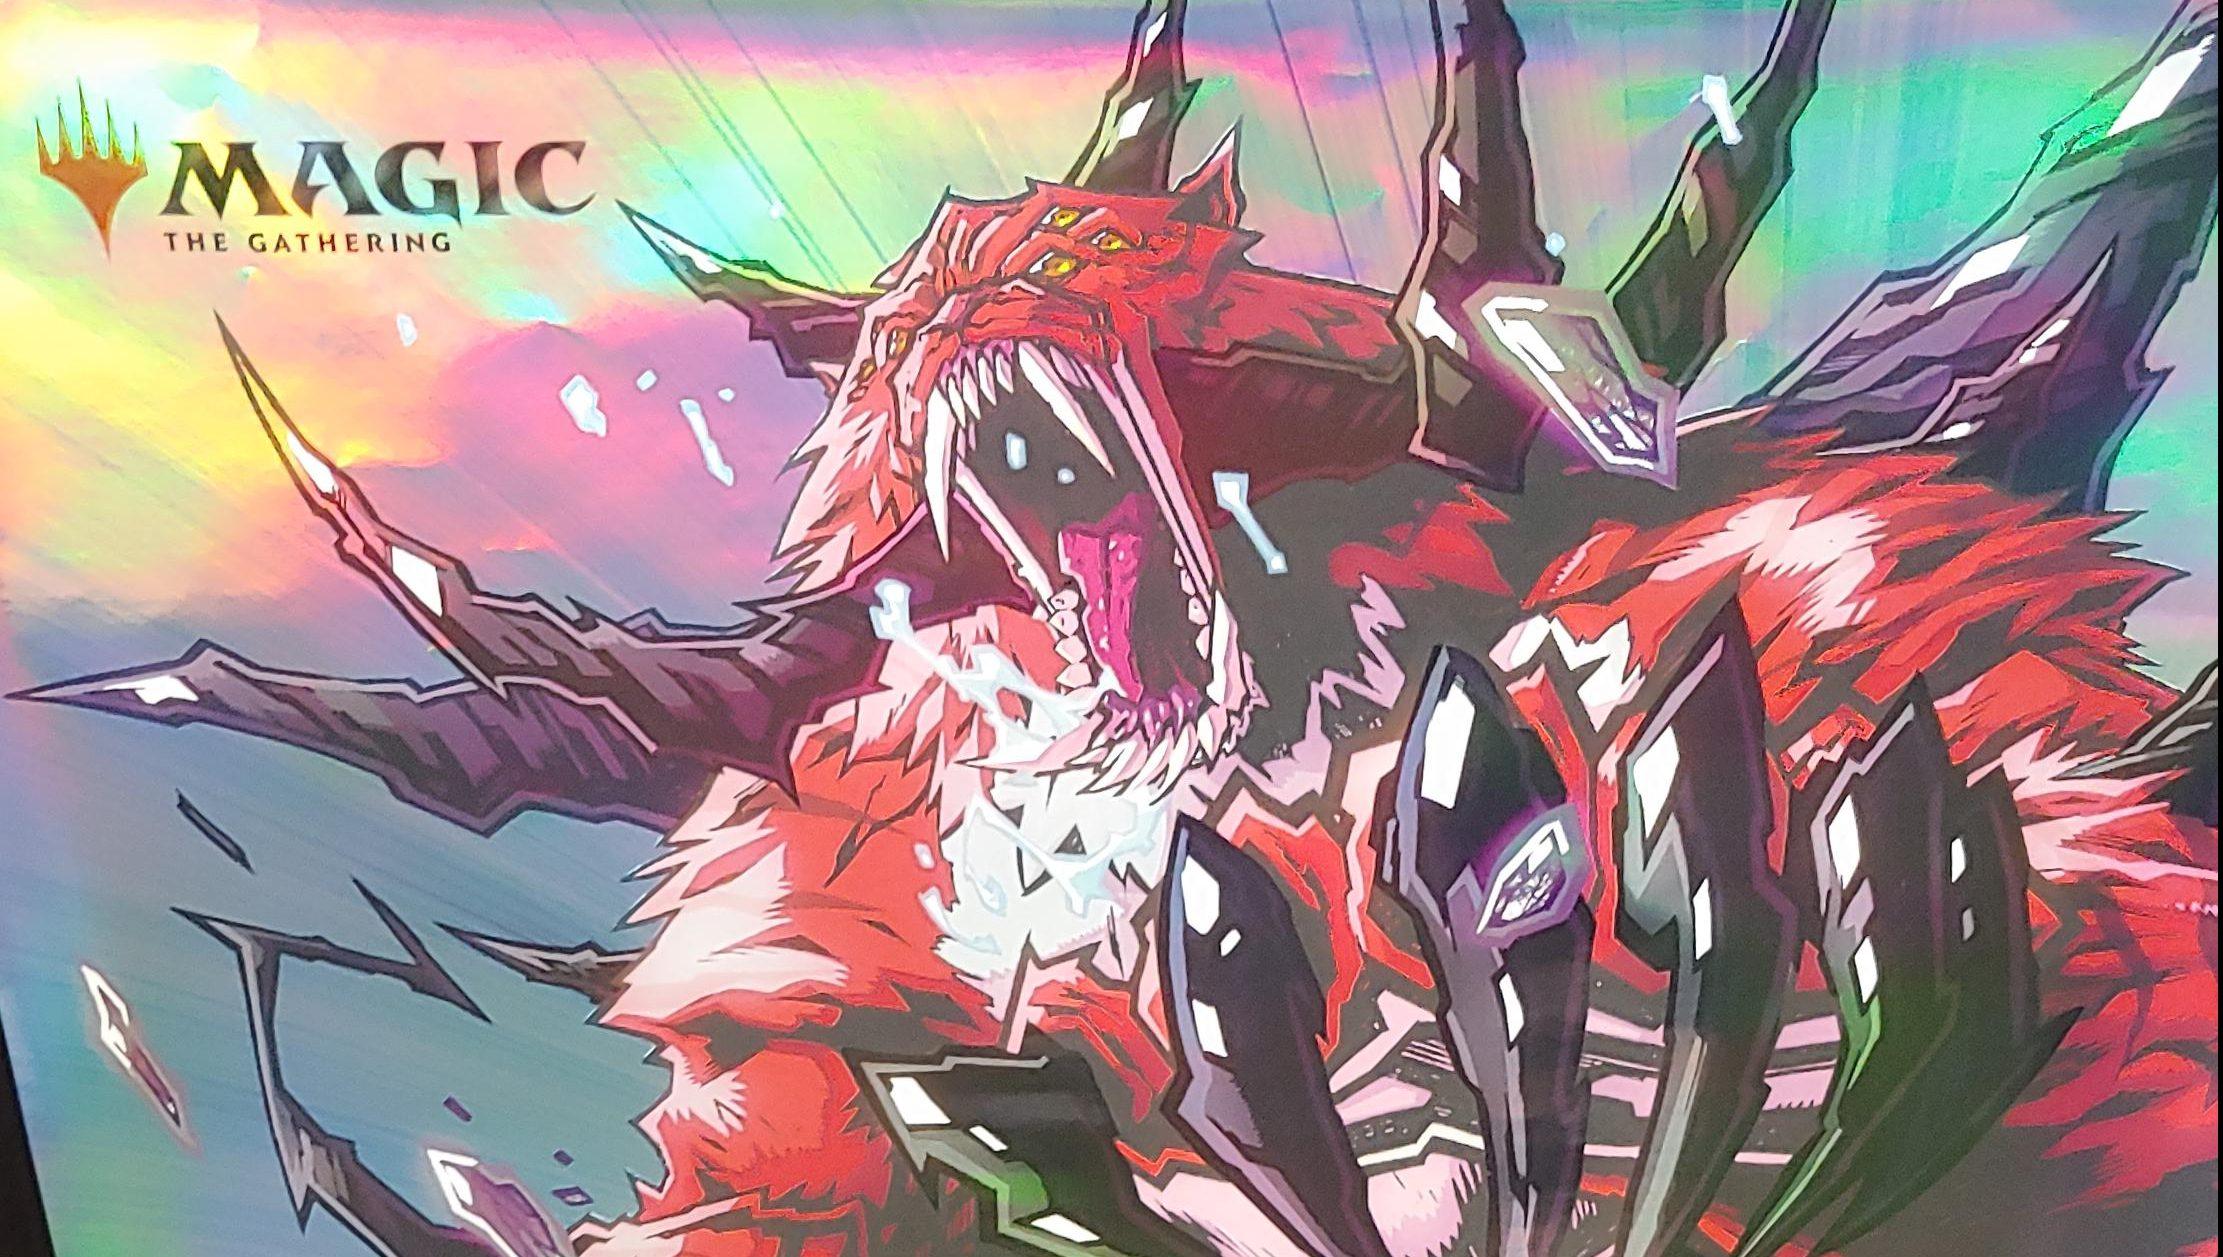 Ikoria Lair of Behemoths Promo Poster